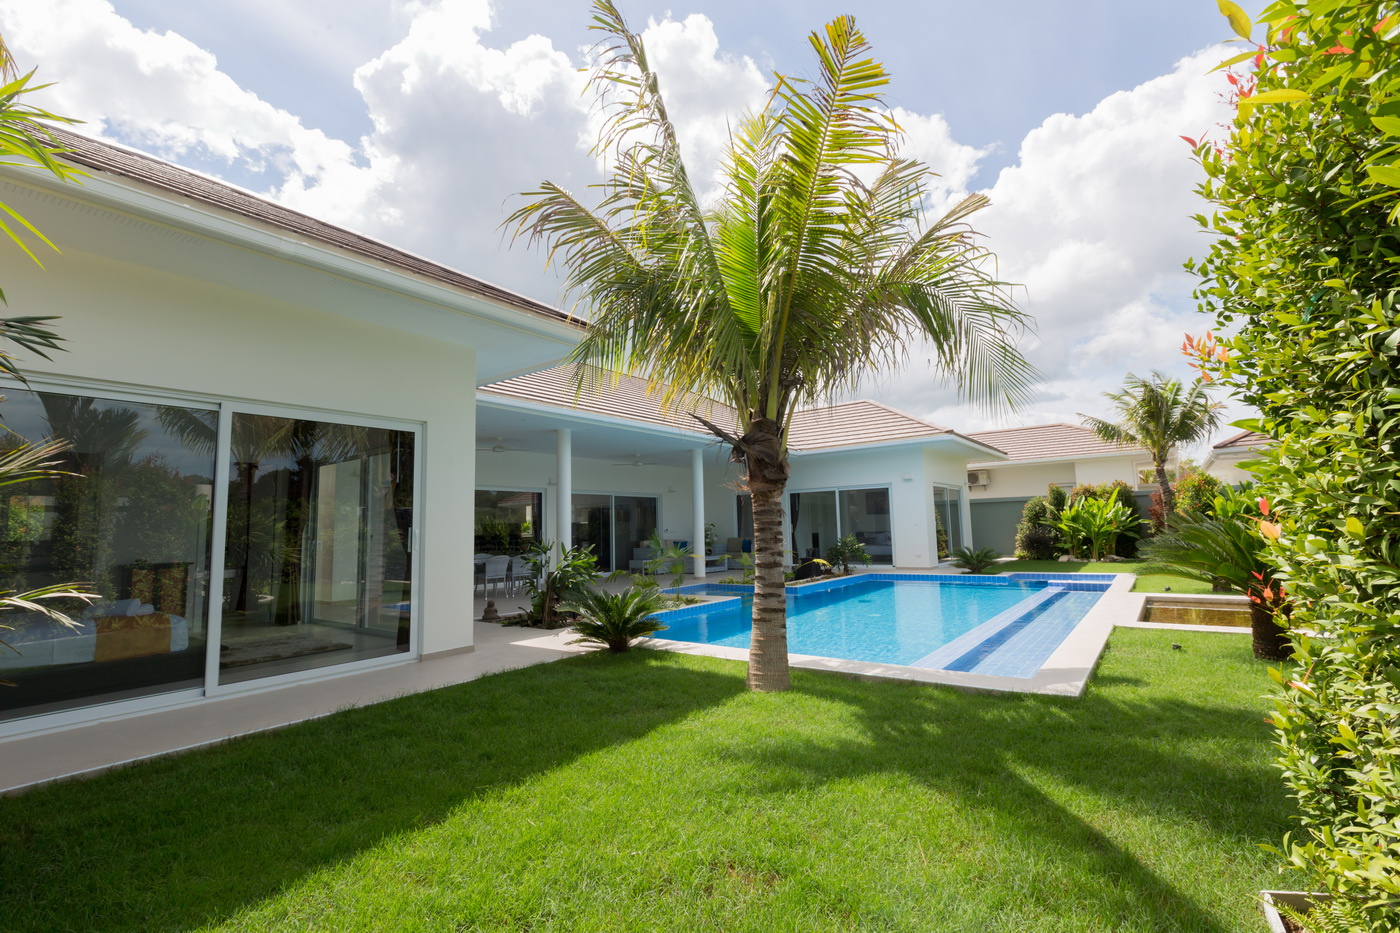 PALM AVENUE 2 - Brand New, Resales, Palm Avenue 3 Launch July 2021